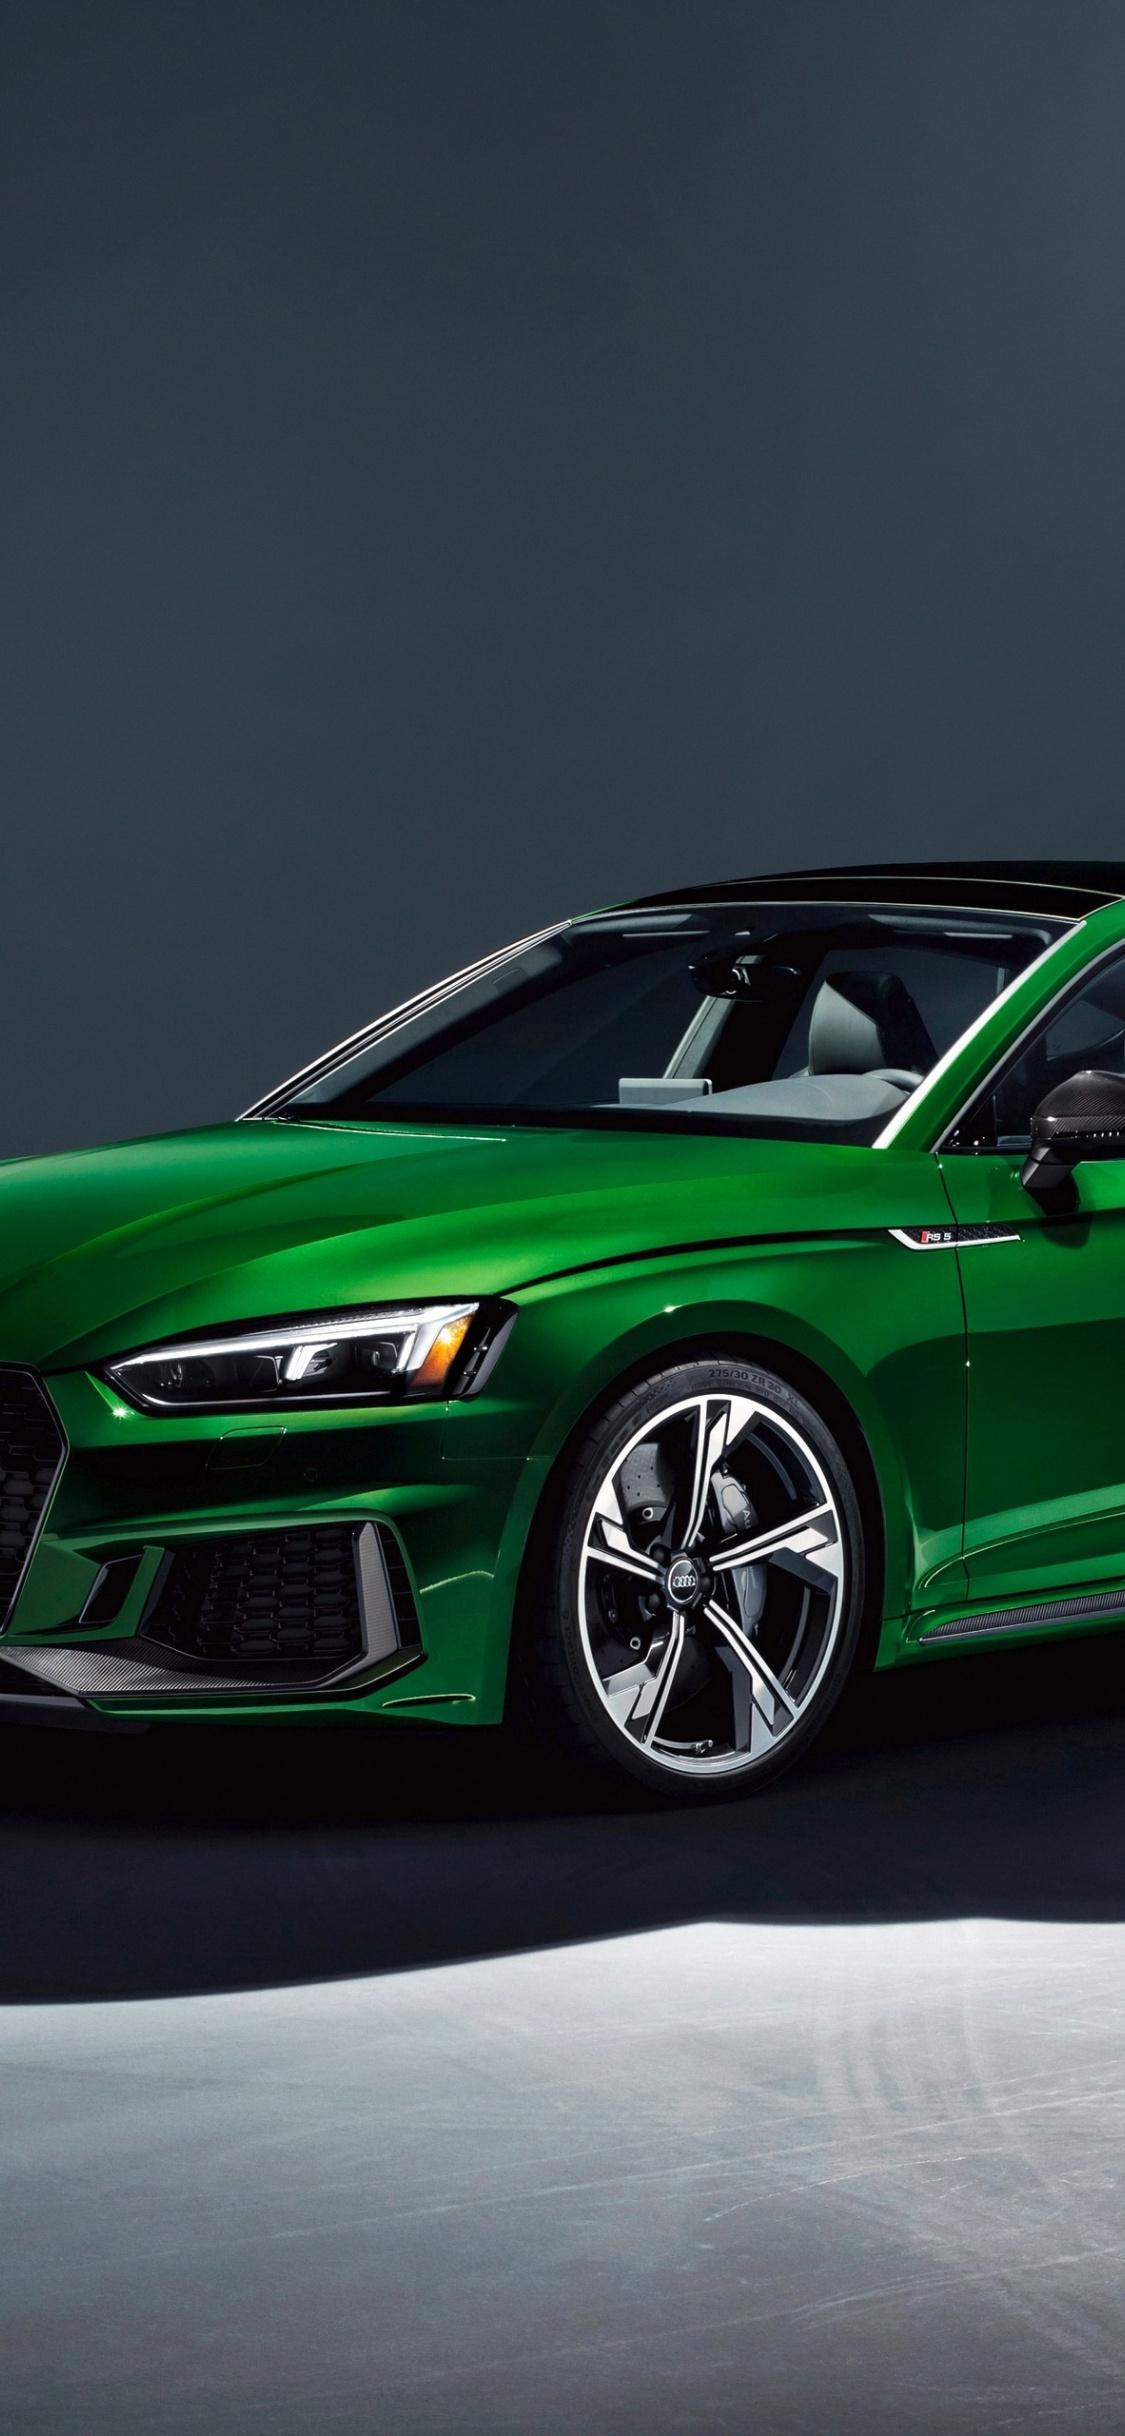 2019 Audi Rs5 Sportback Green Car Wallpaper 2019 Audi Rs5 2170333 Hd Wallpaper Backgrounds Download